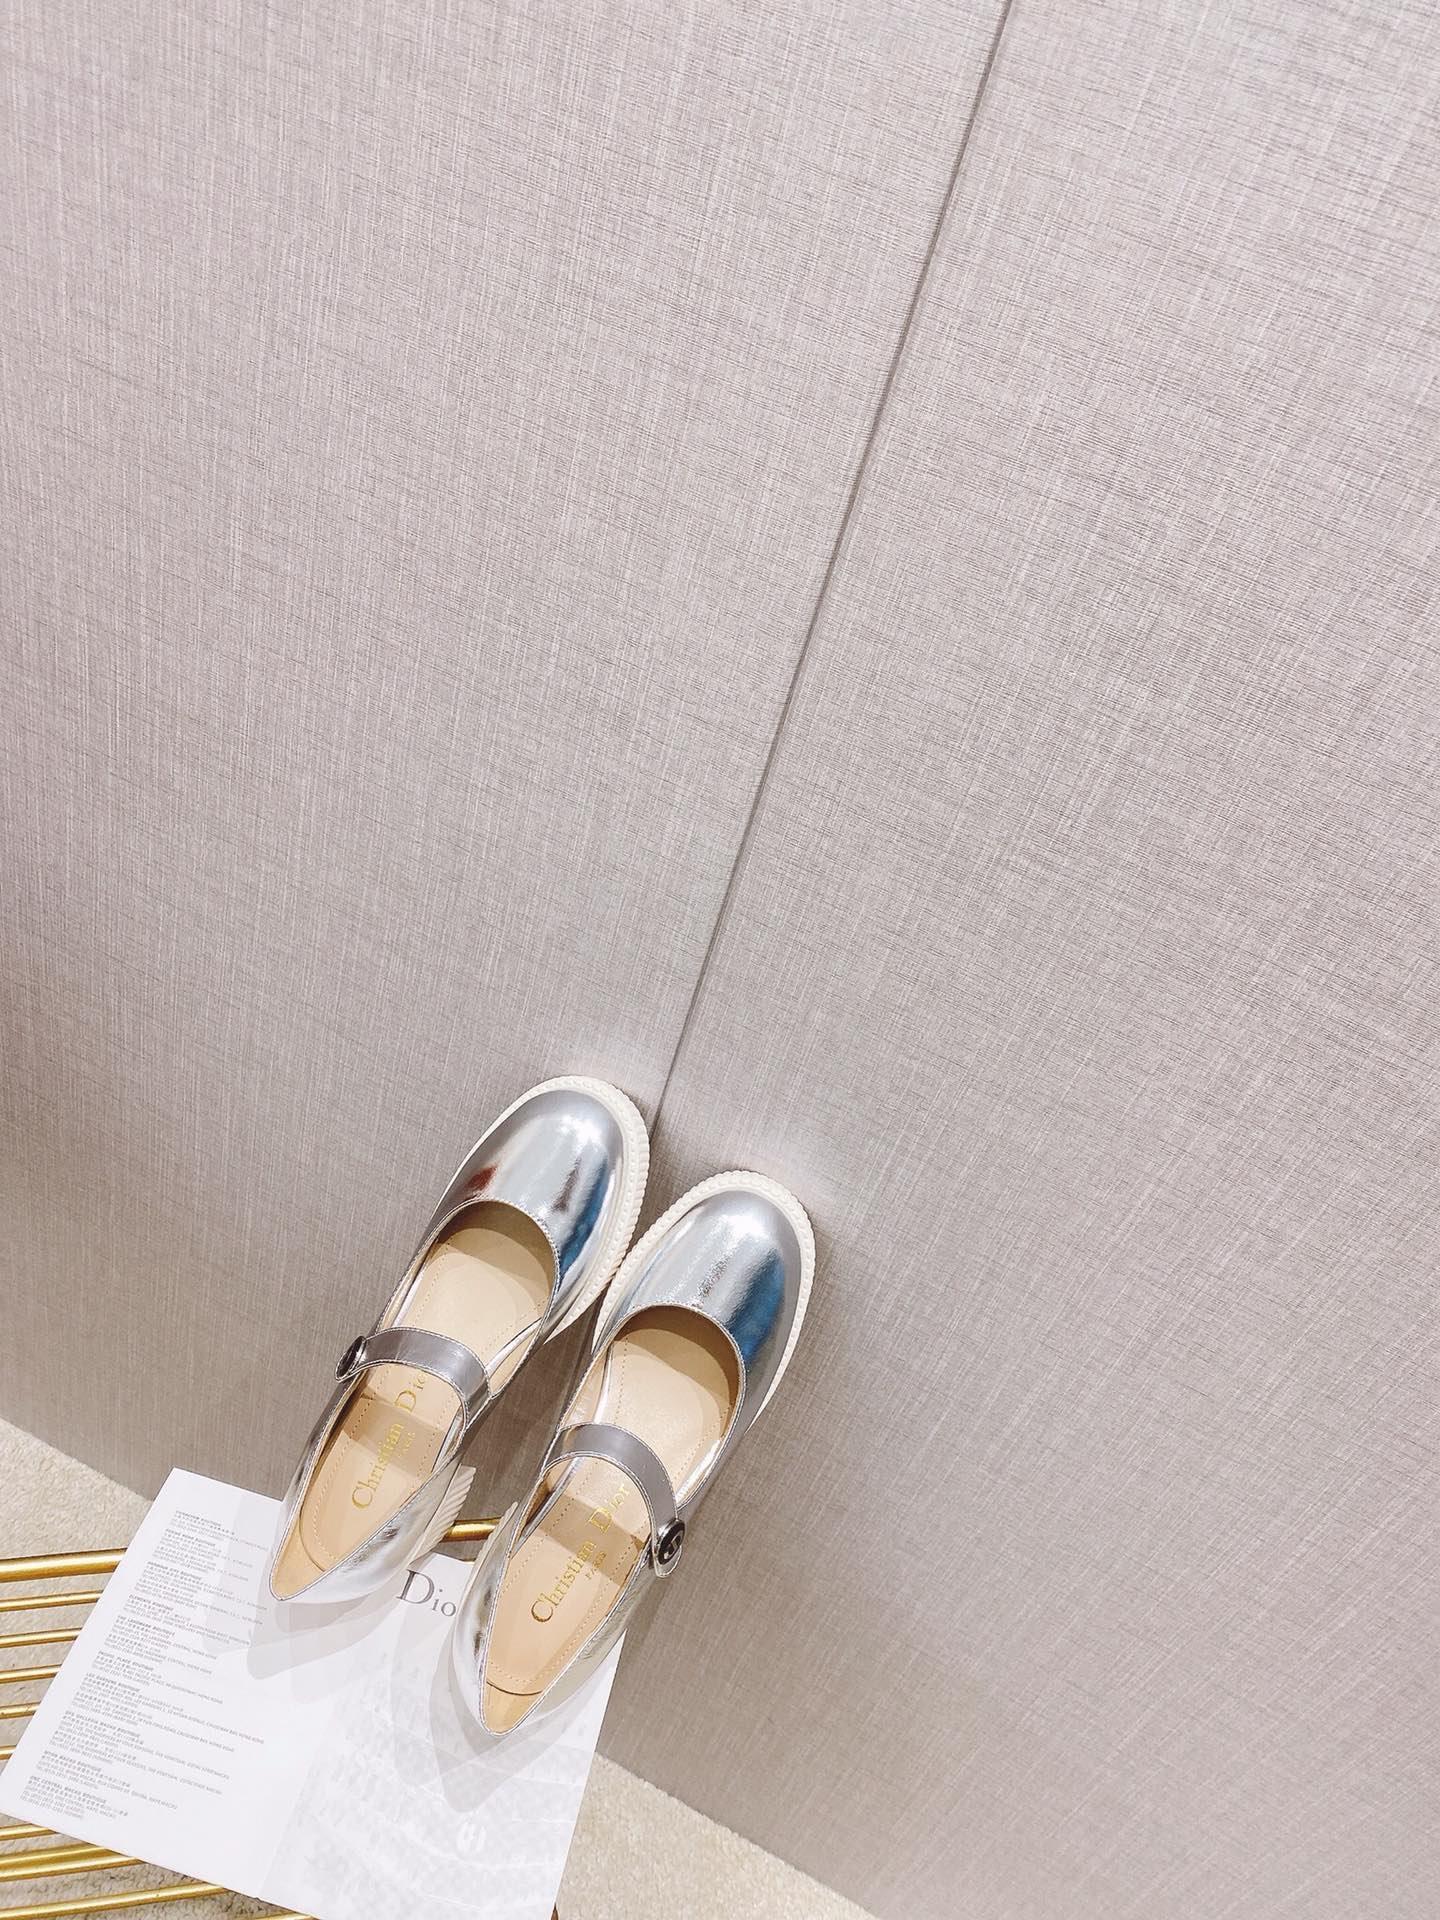 Dior 软漆玛丽珍   CD圆头高跟鞋!